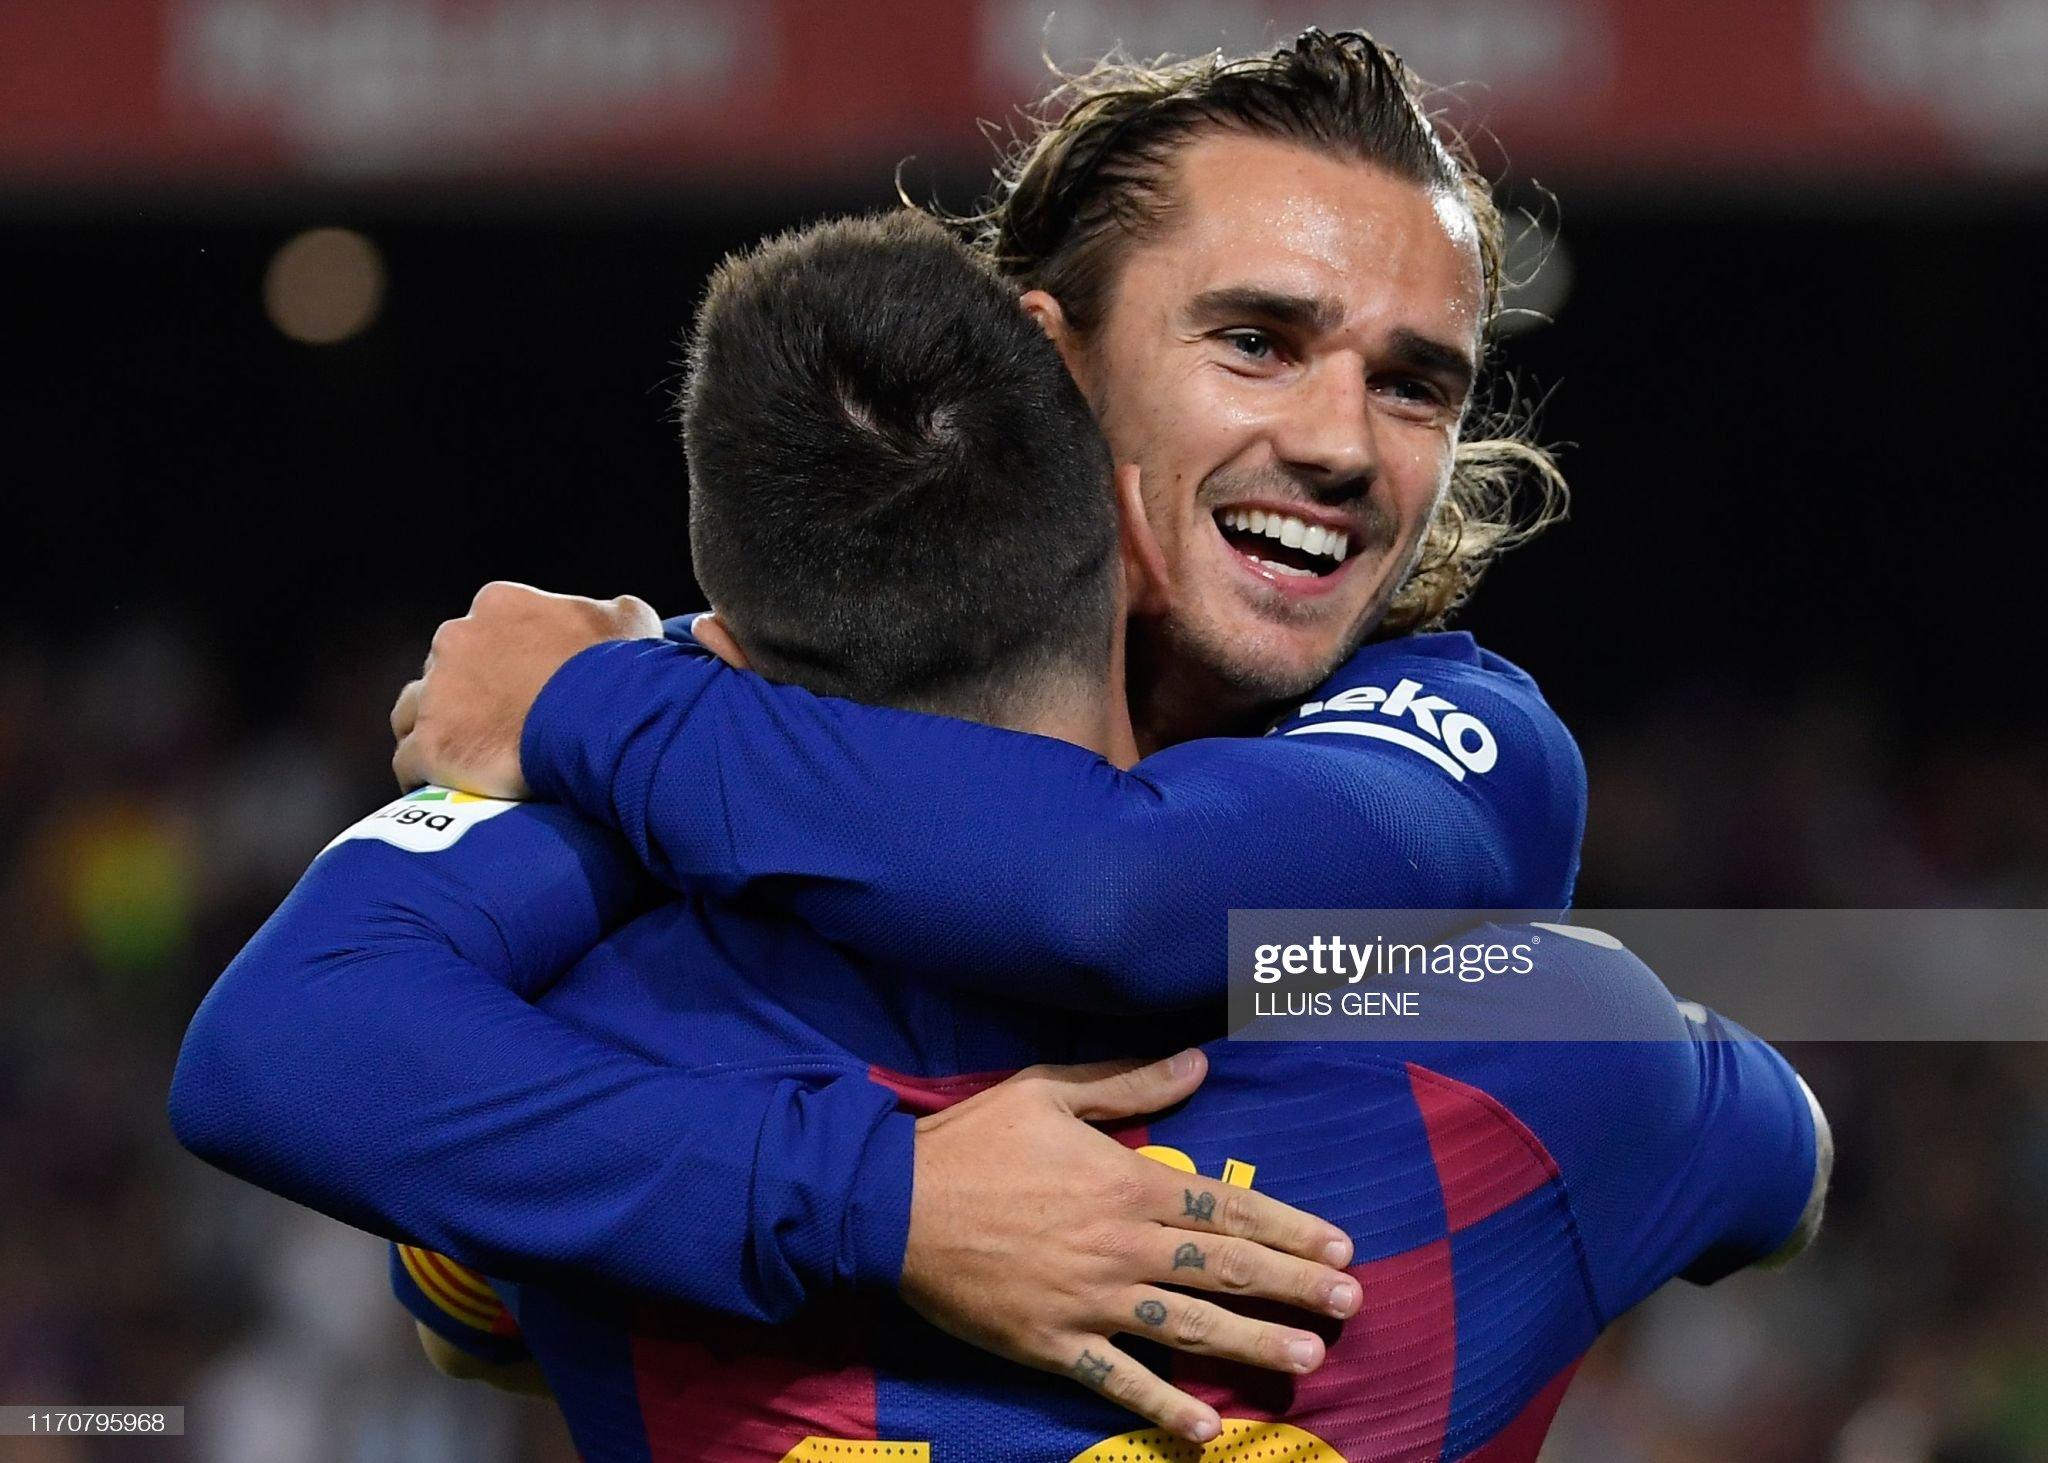 صور مباراة : برشلونة - فياريال 2-1 ( 24-09-2019 )  Barcelonas-french-forward-antoine-griezmann-is-congratulated-by-picture-id1170795968?s=2048x2048